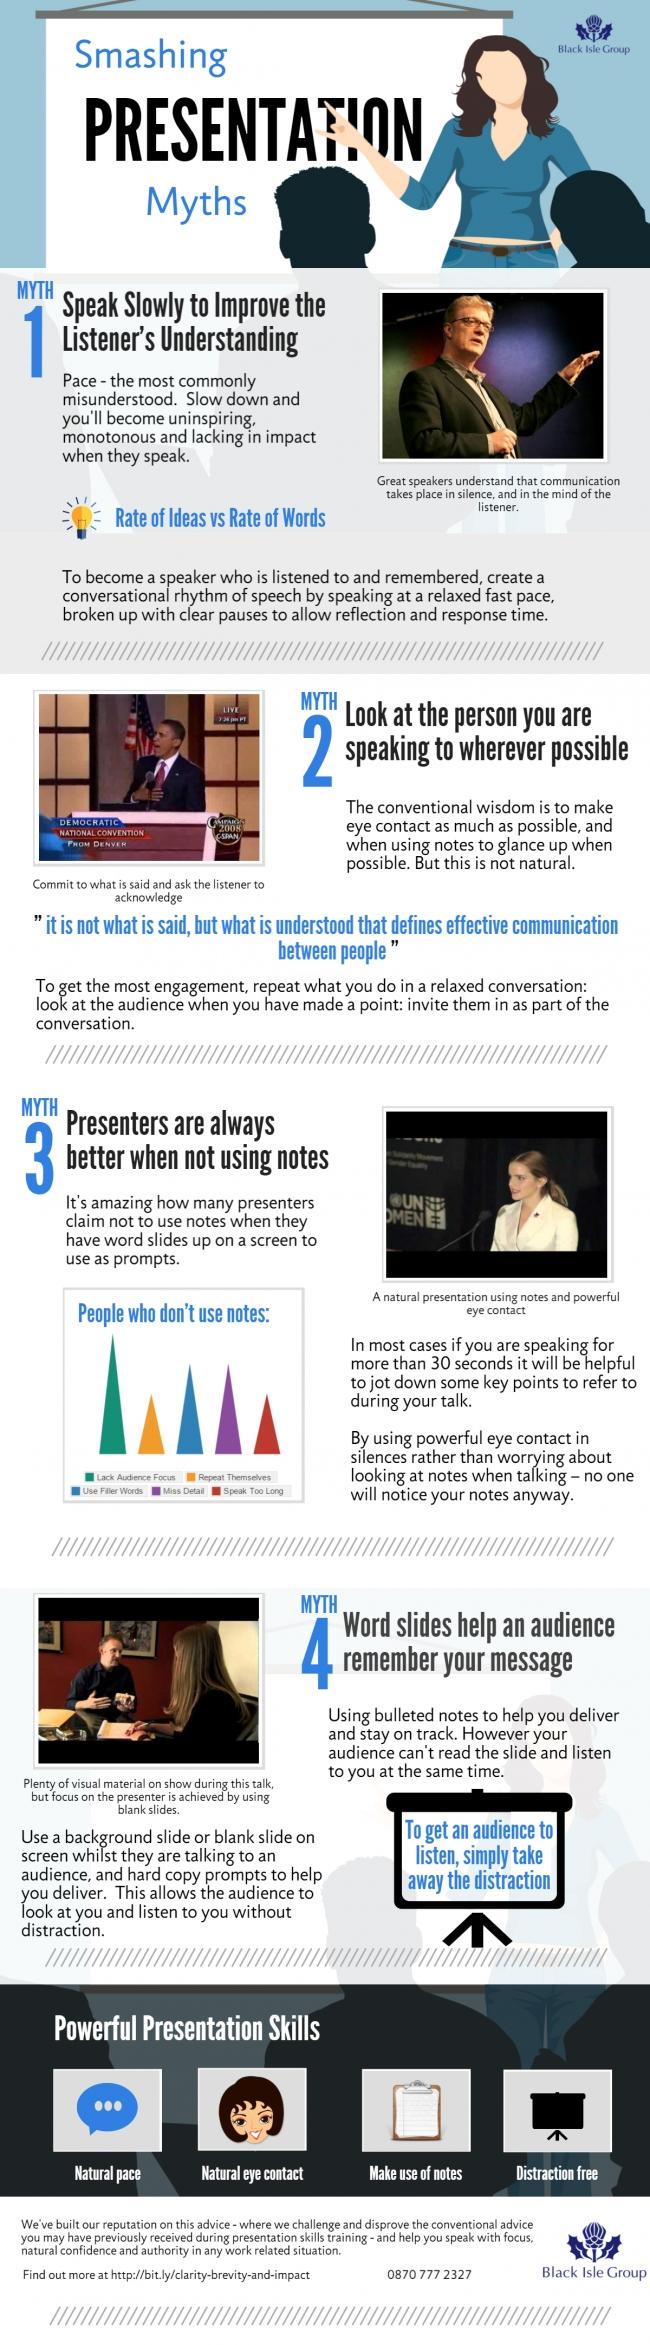 presentation-myths